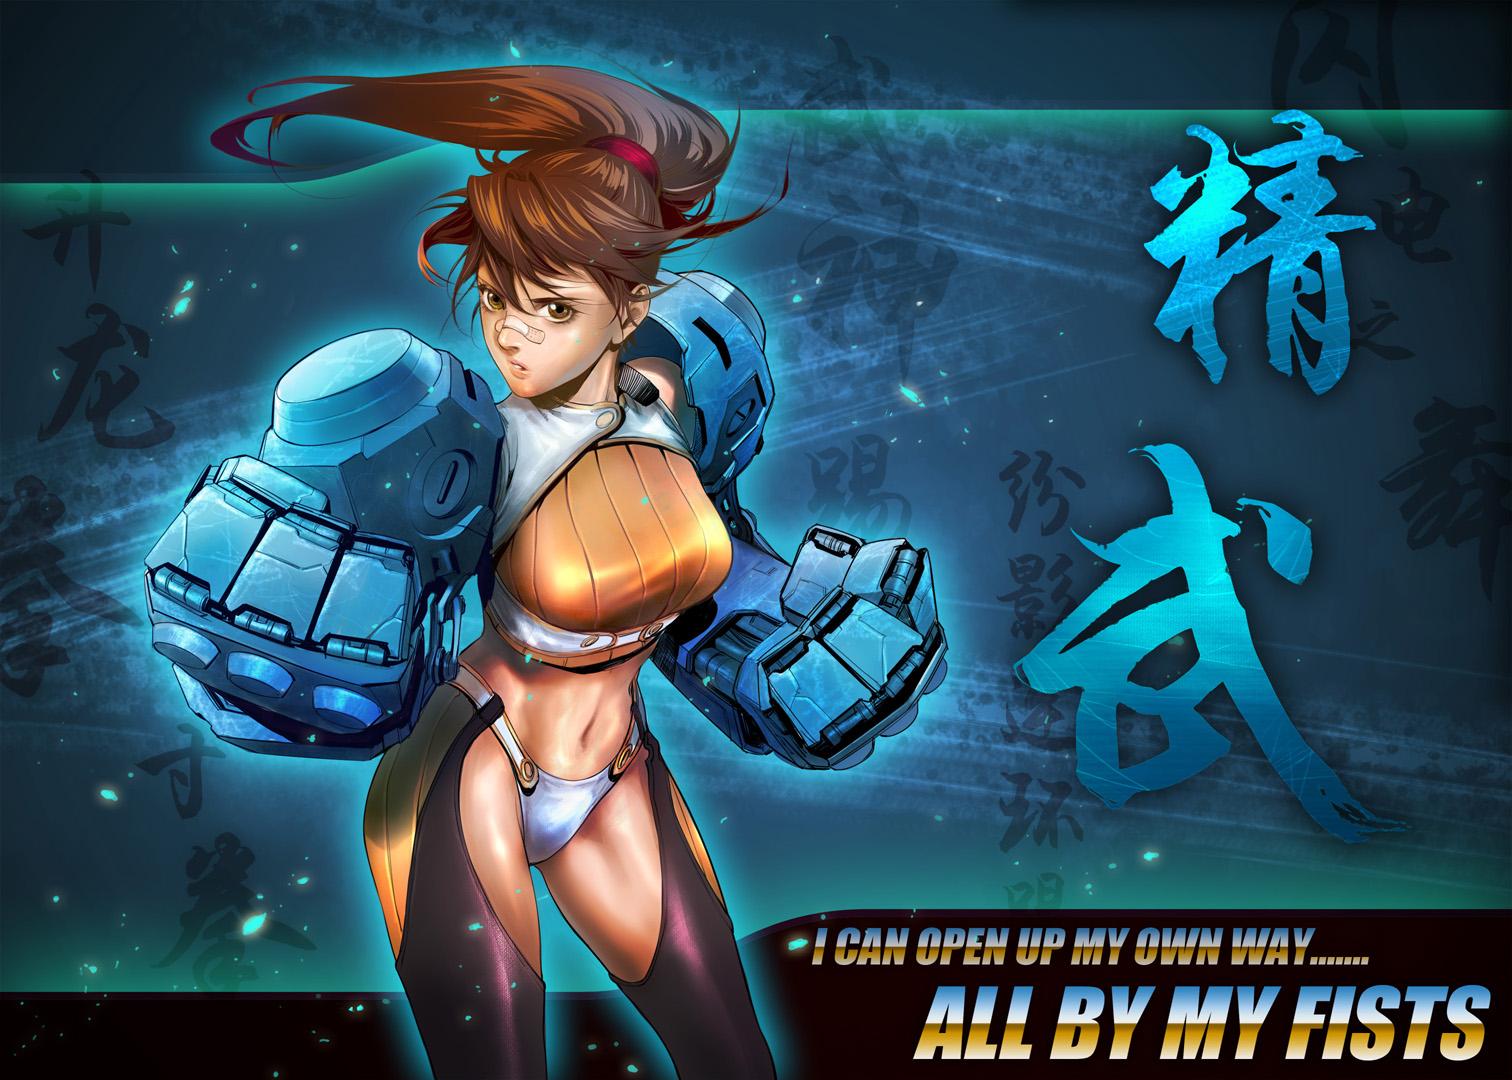 fan art of my favorite game by zhoupeng